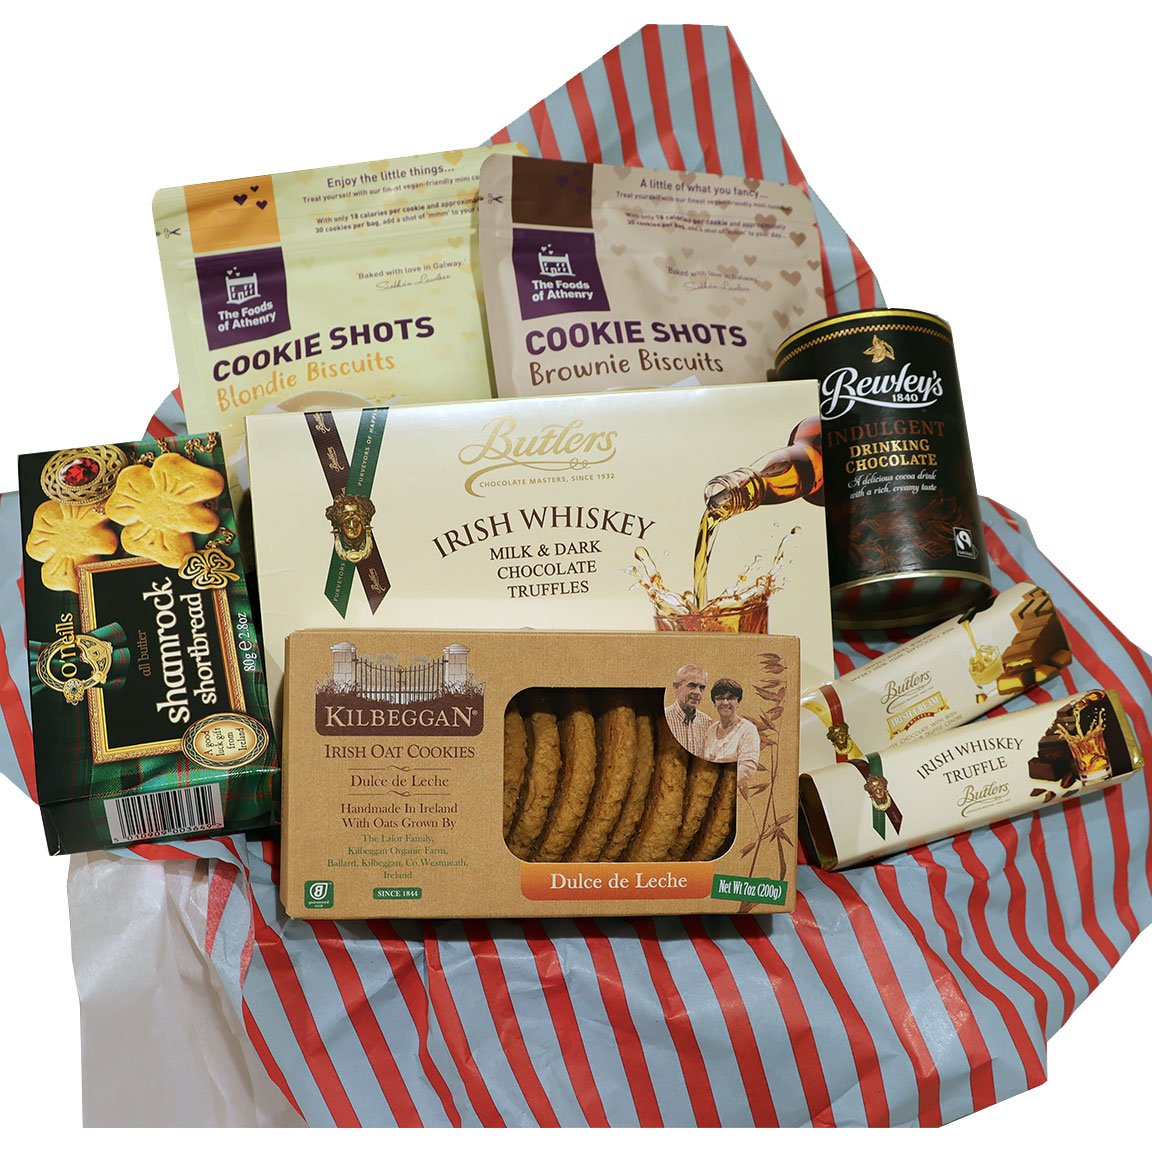 Spirited Chocolate & Cookie Snack Basket